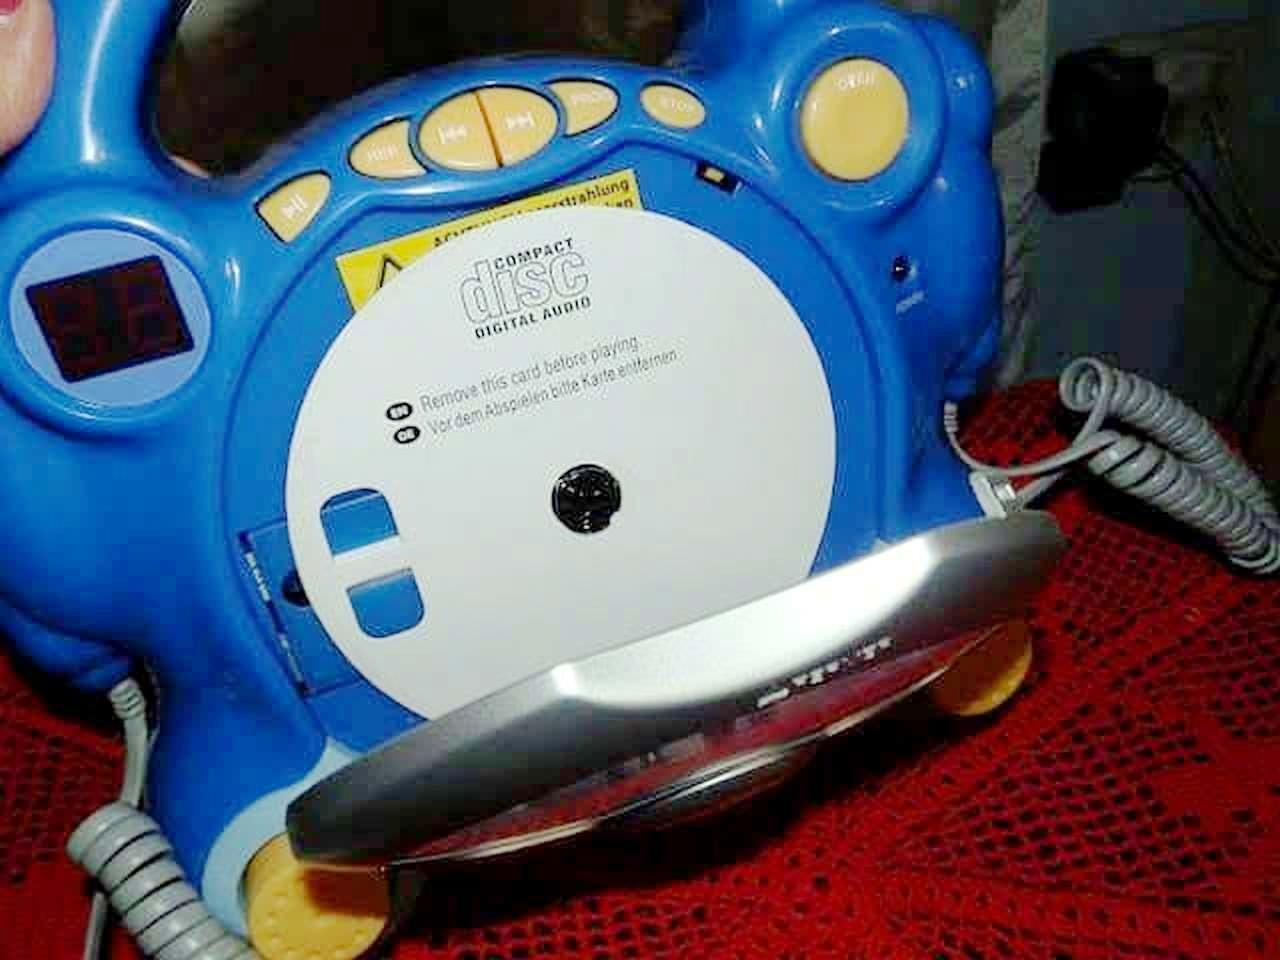 AUNA POCKET ROCKER: Lettore CD Karaoke per i bimbi